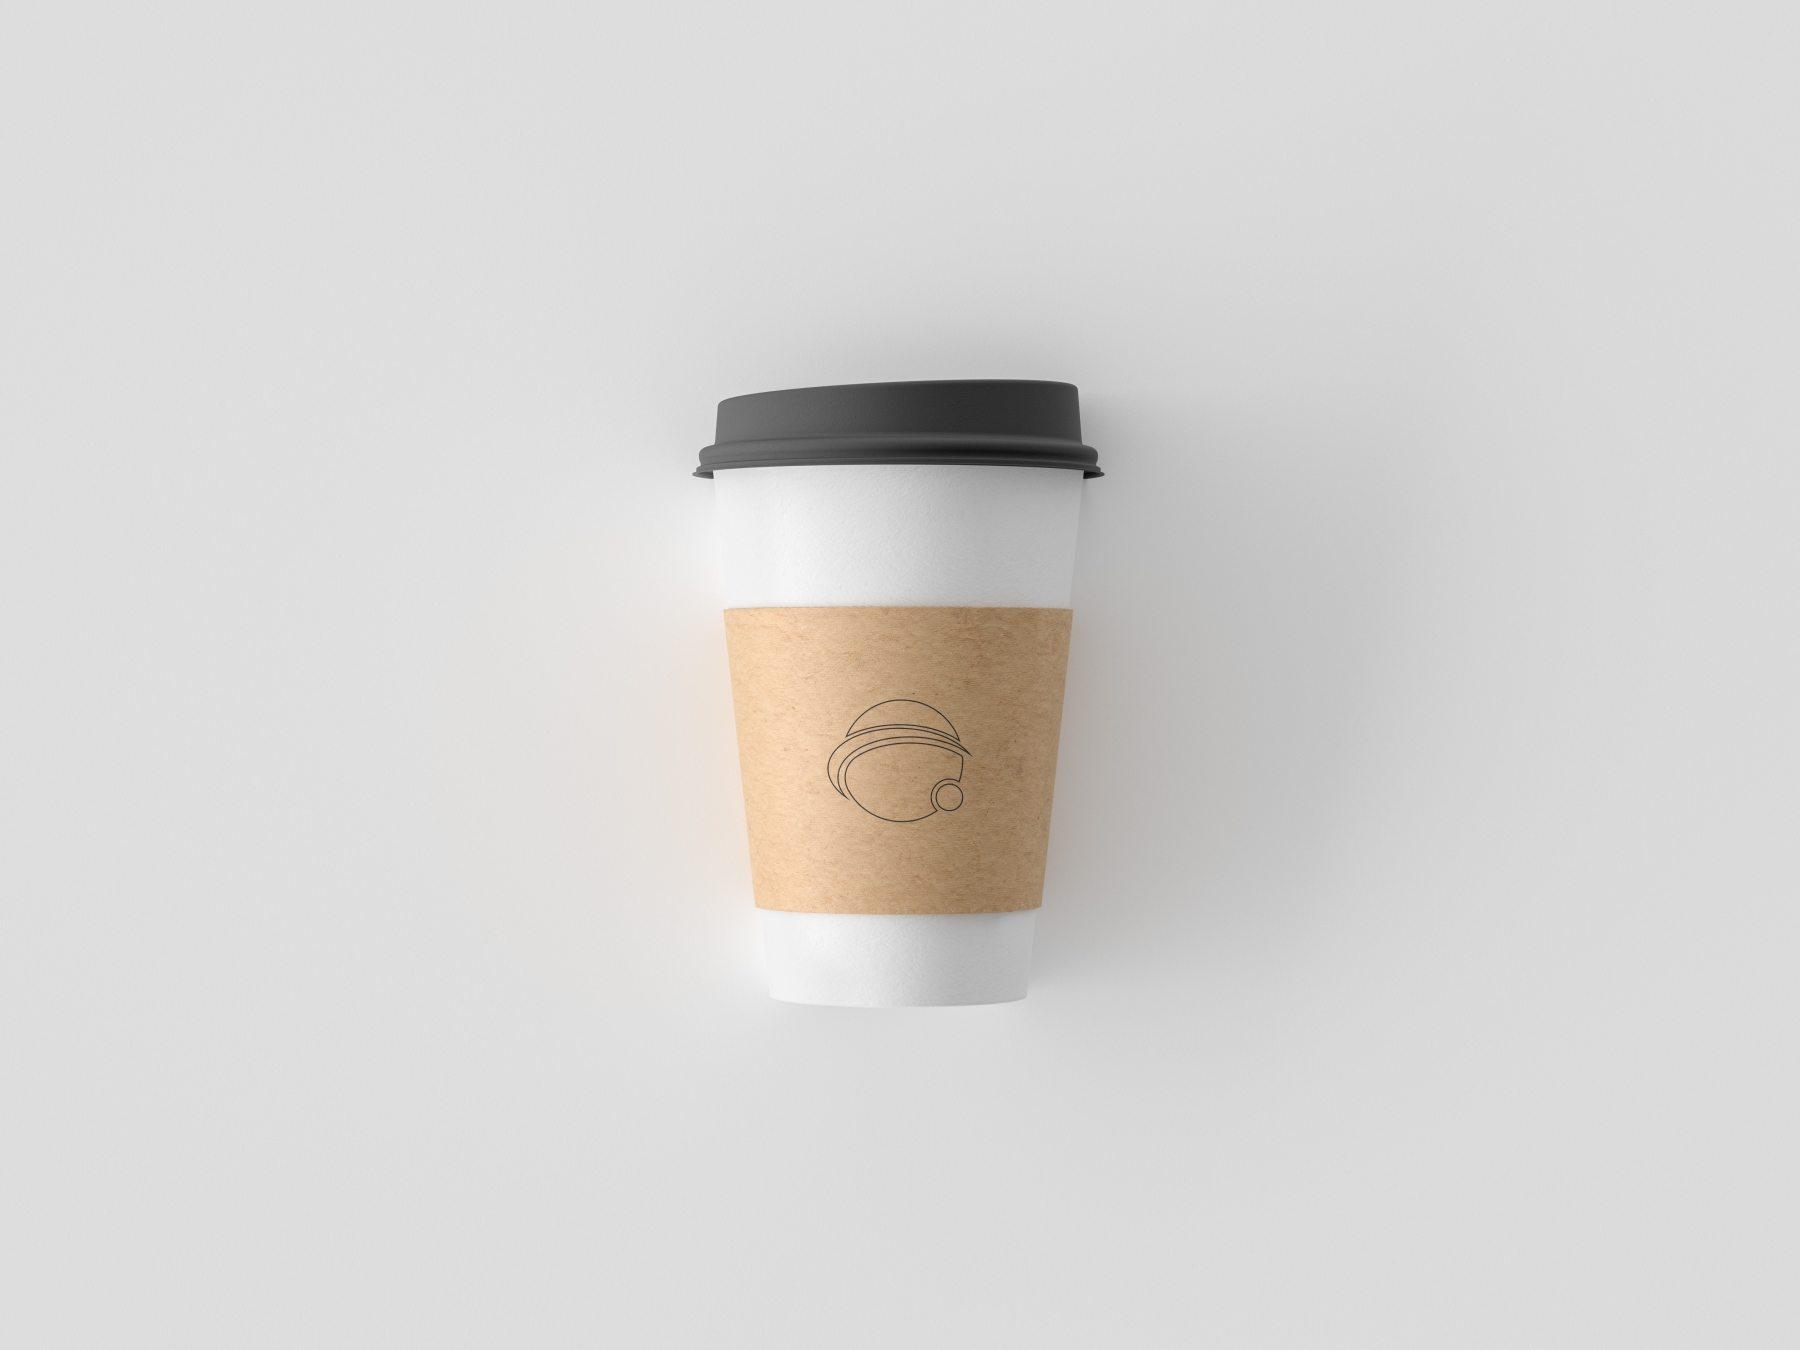 1569725078 68d4ed409e82059 - 复古简约咖啡杯logo样机